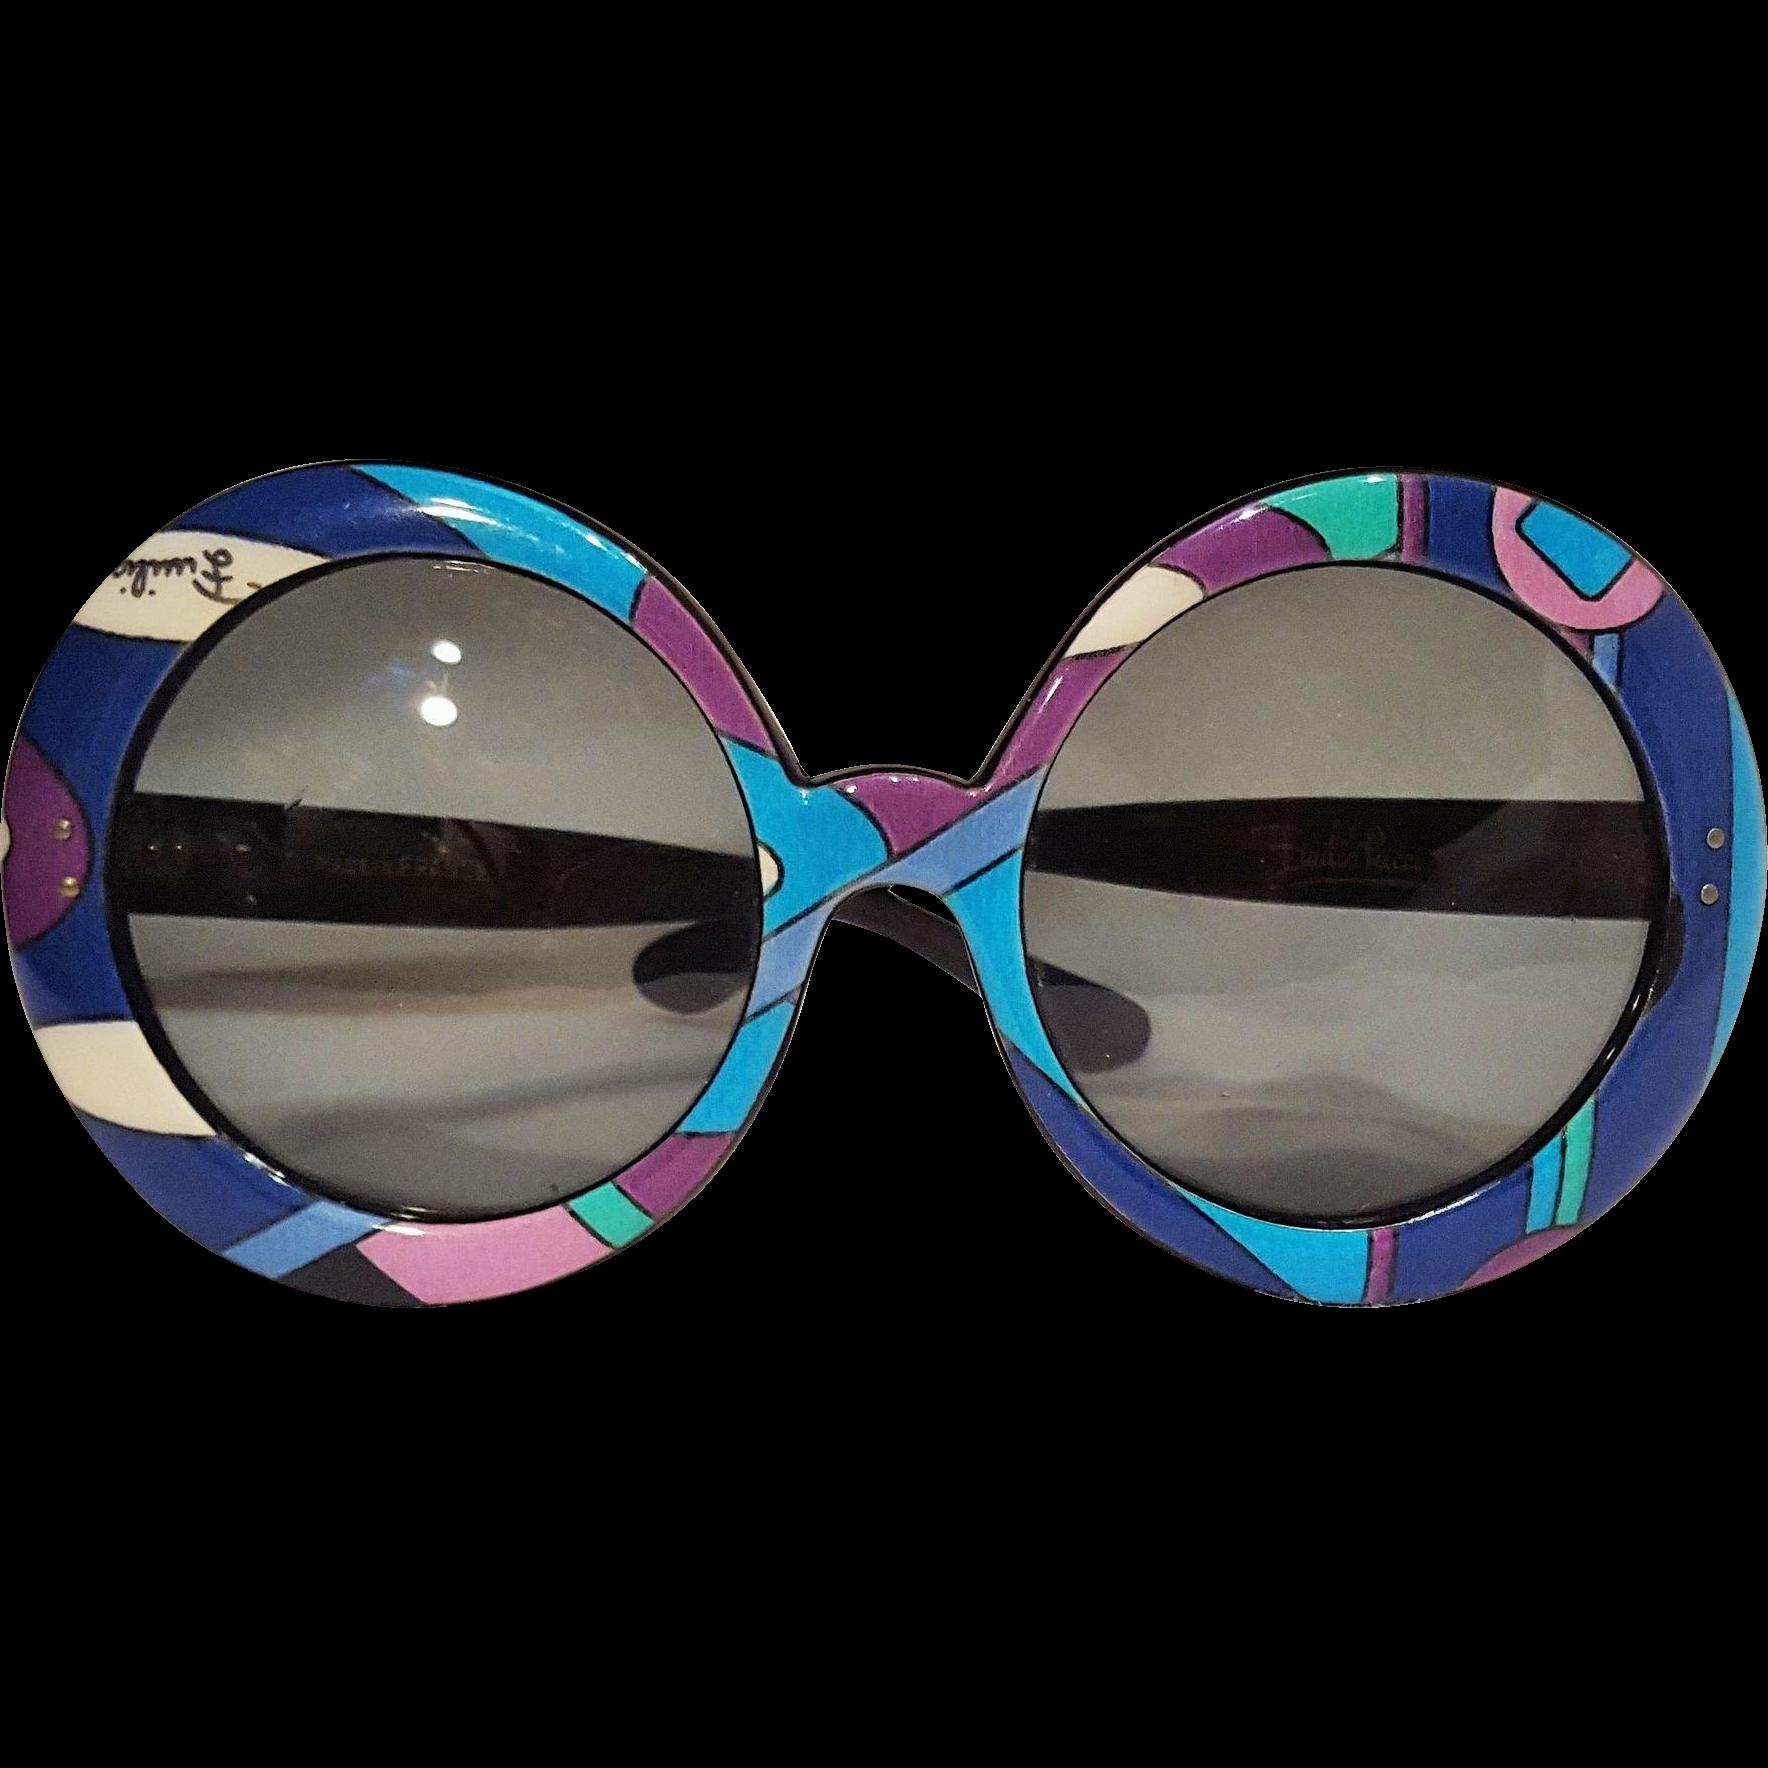 Pucci sunglasses psychedelic Vivera print round oversized ...